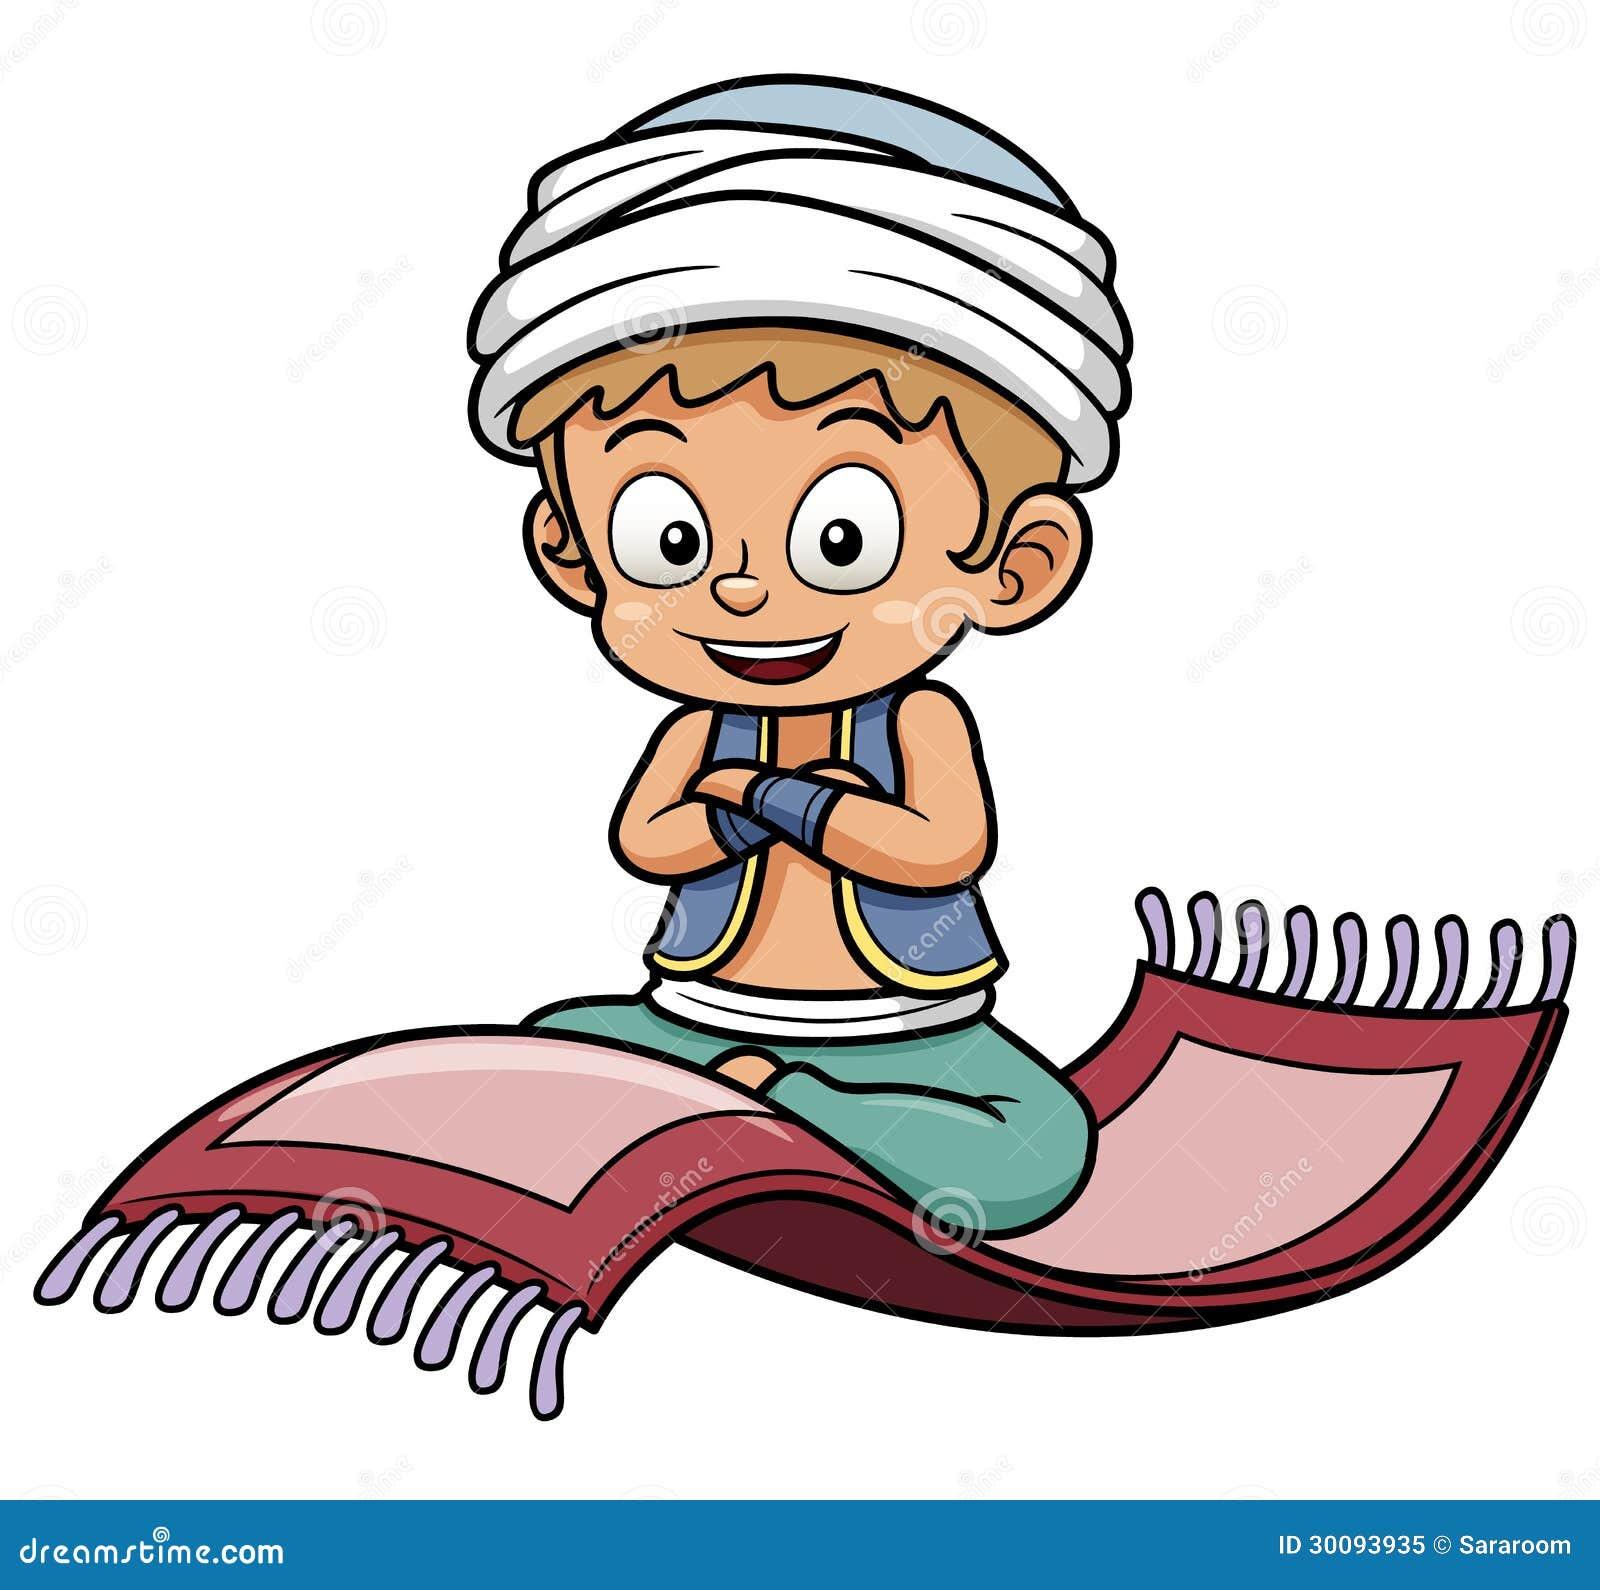 Boy Sitting On Flying Carpet Royalty Free Stock Photo